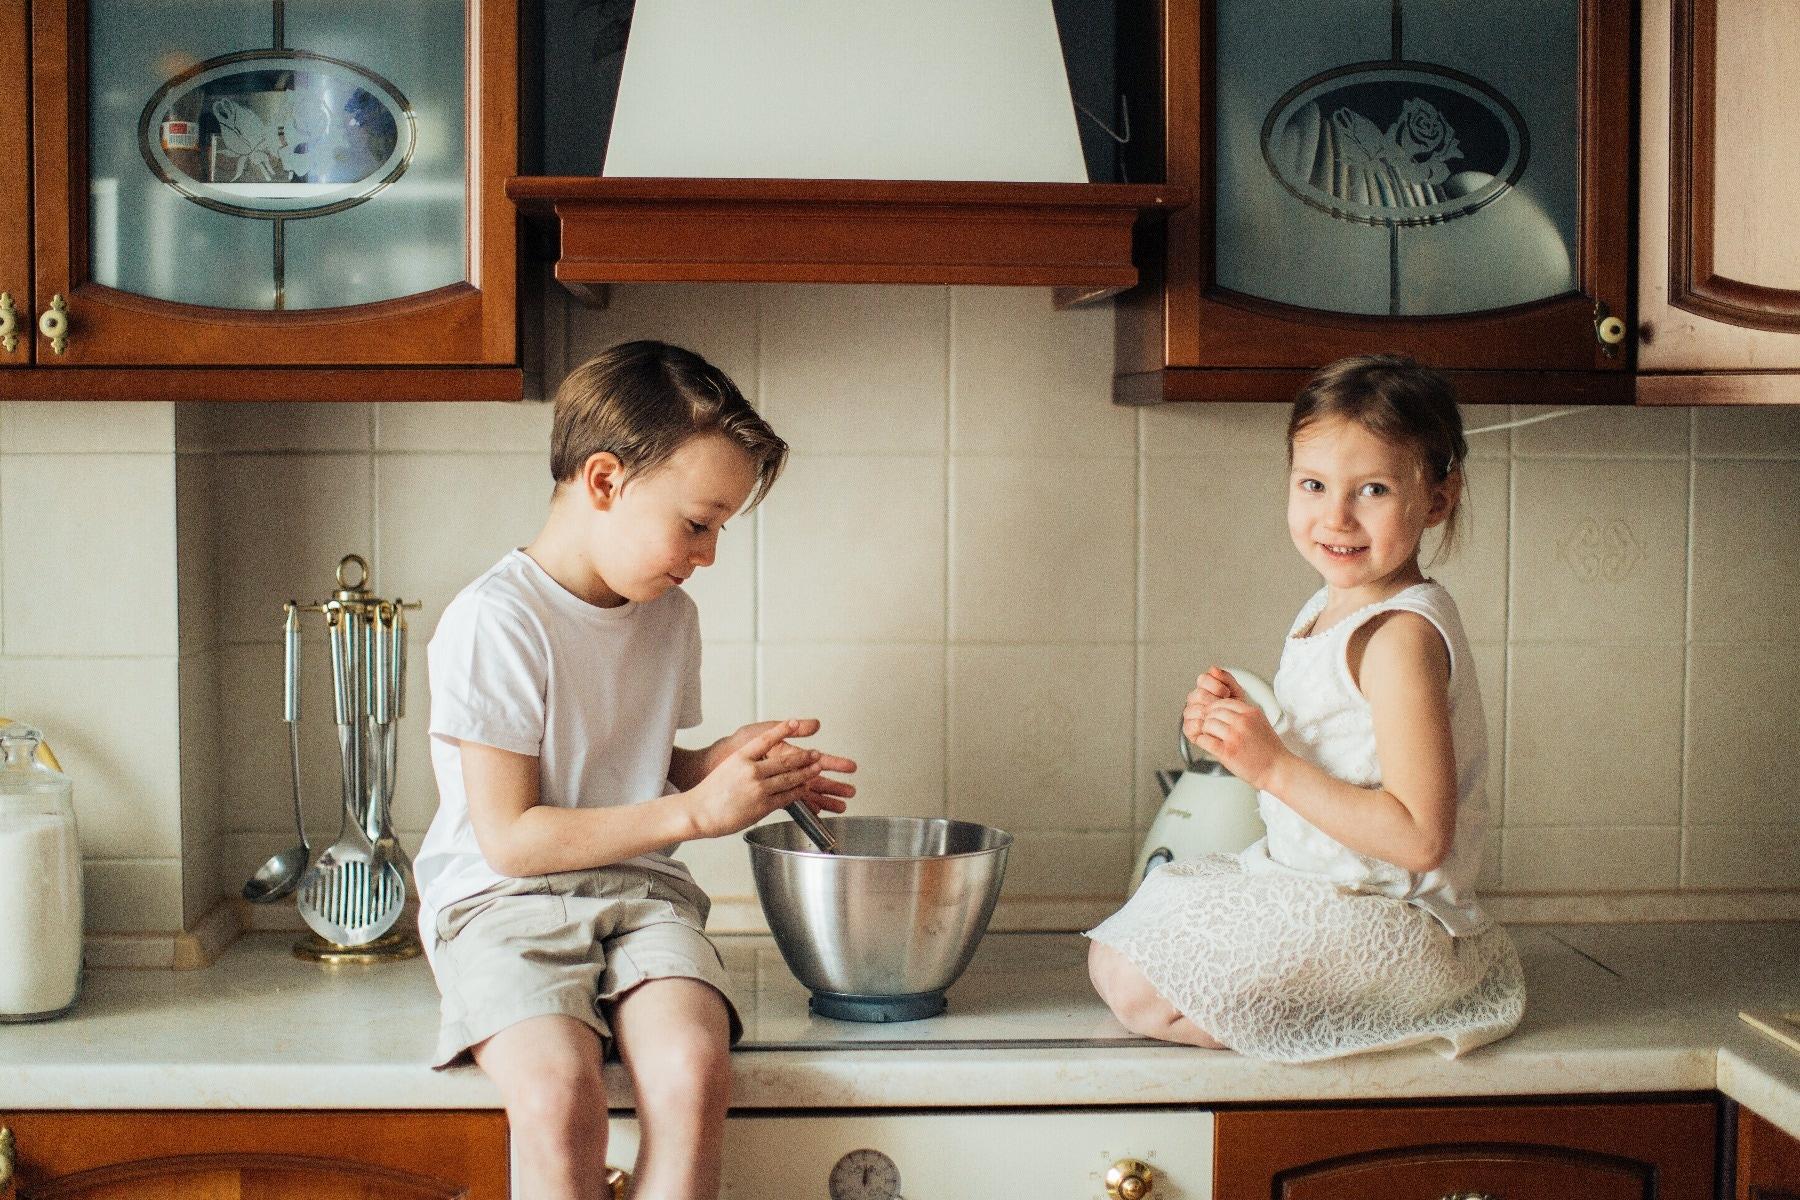 kids baking on kitchen counter top